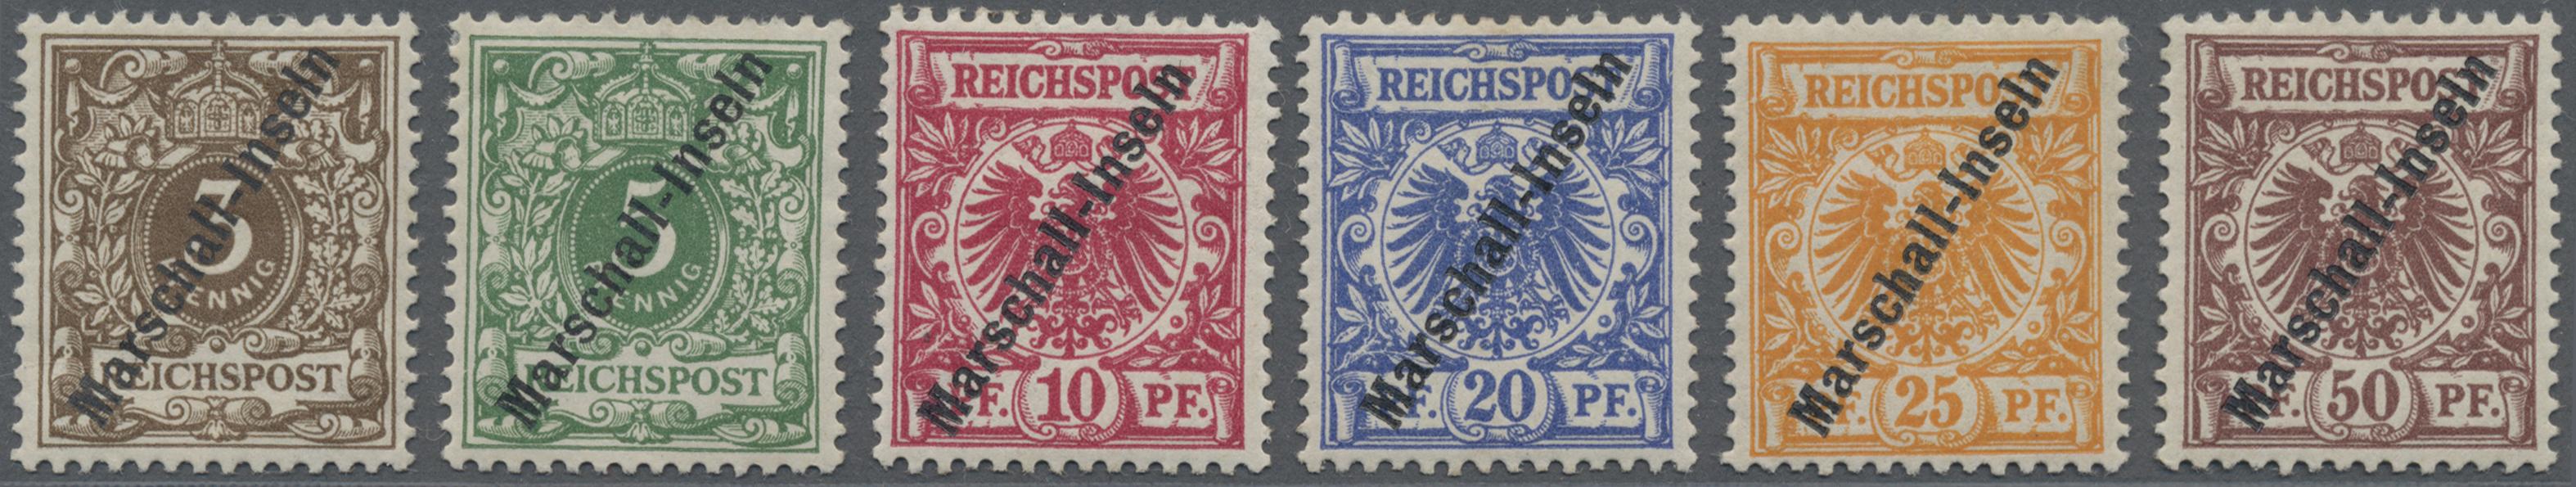 Lot 11480 - Deutsche Kolonien - Marshall-Inseln  -  Auktionshaus Christoph Gärtner GmbH & Co. KG Sale #48 The Single Lots Philatelie